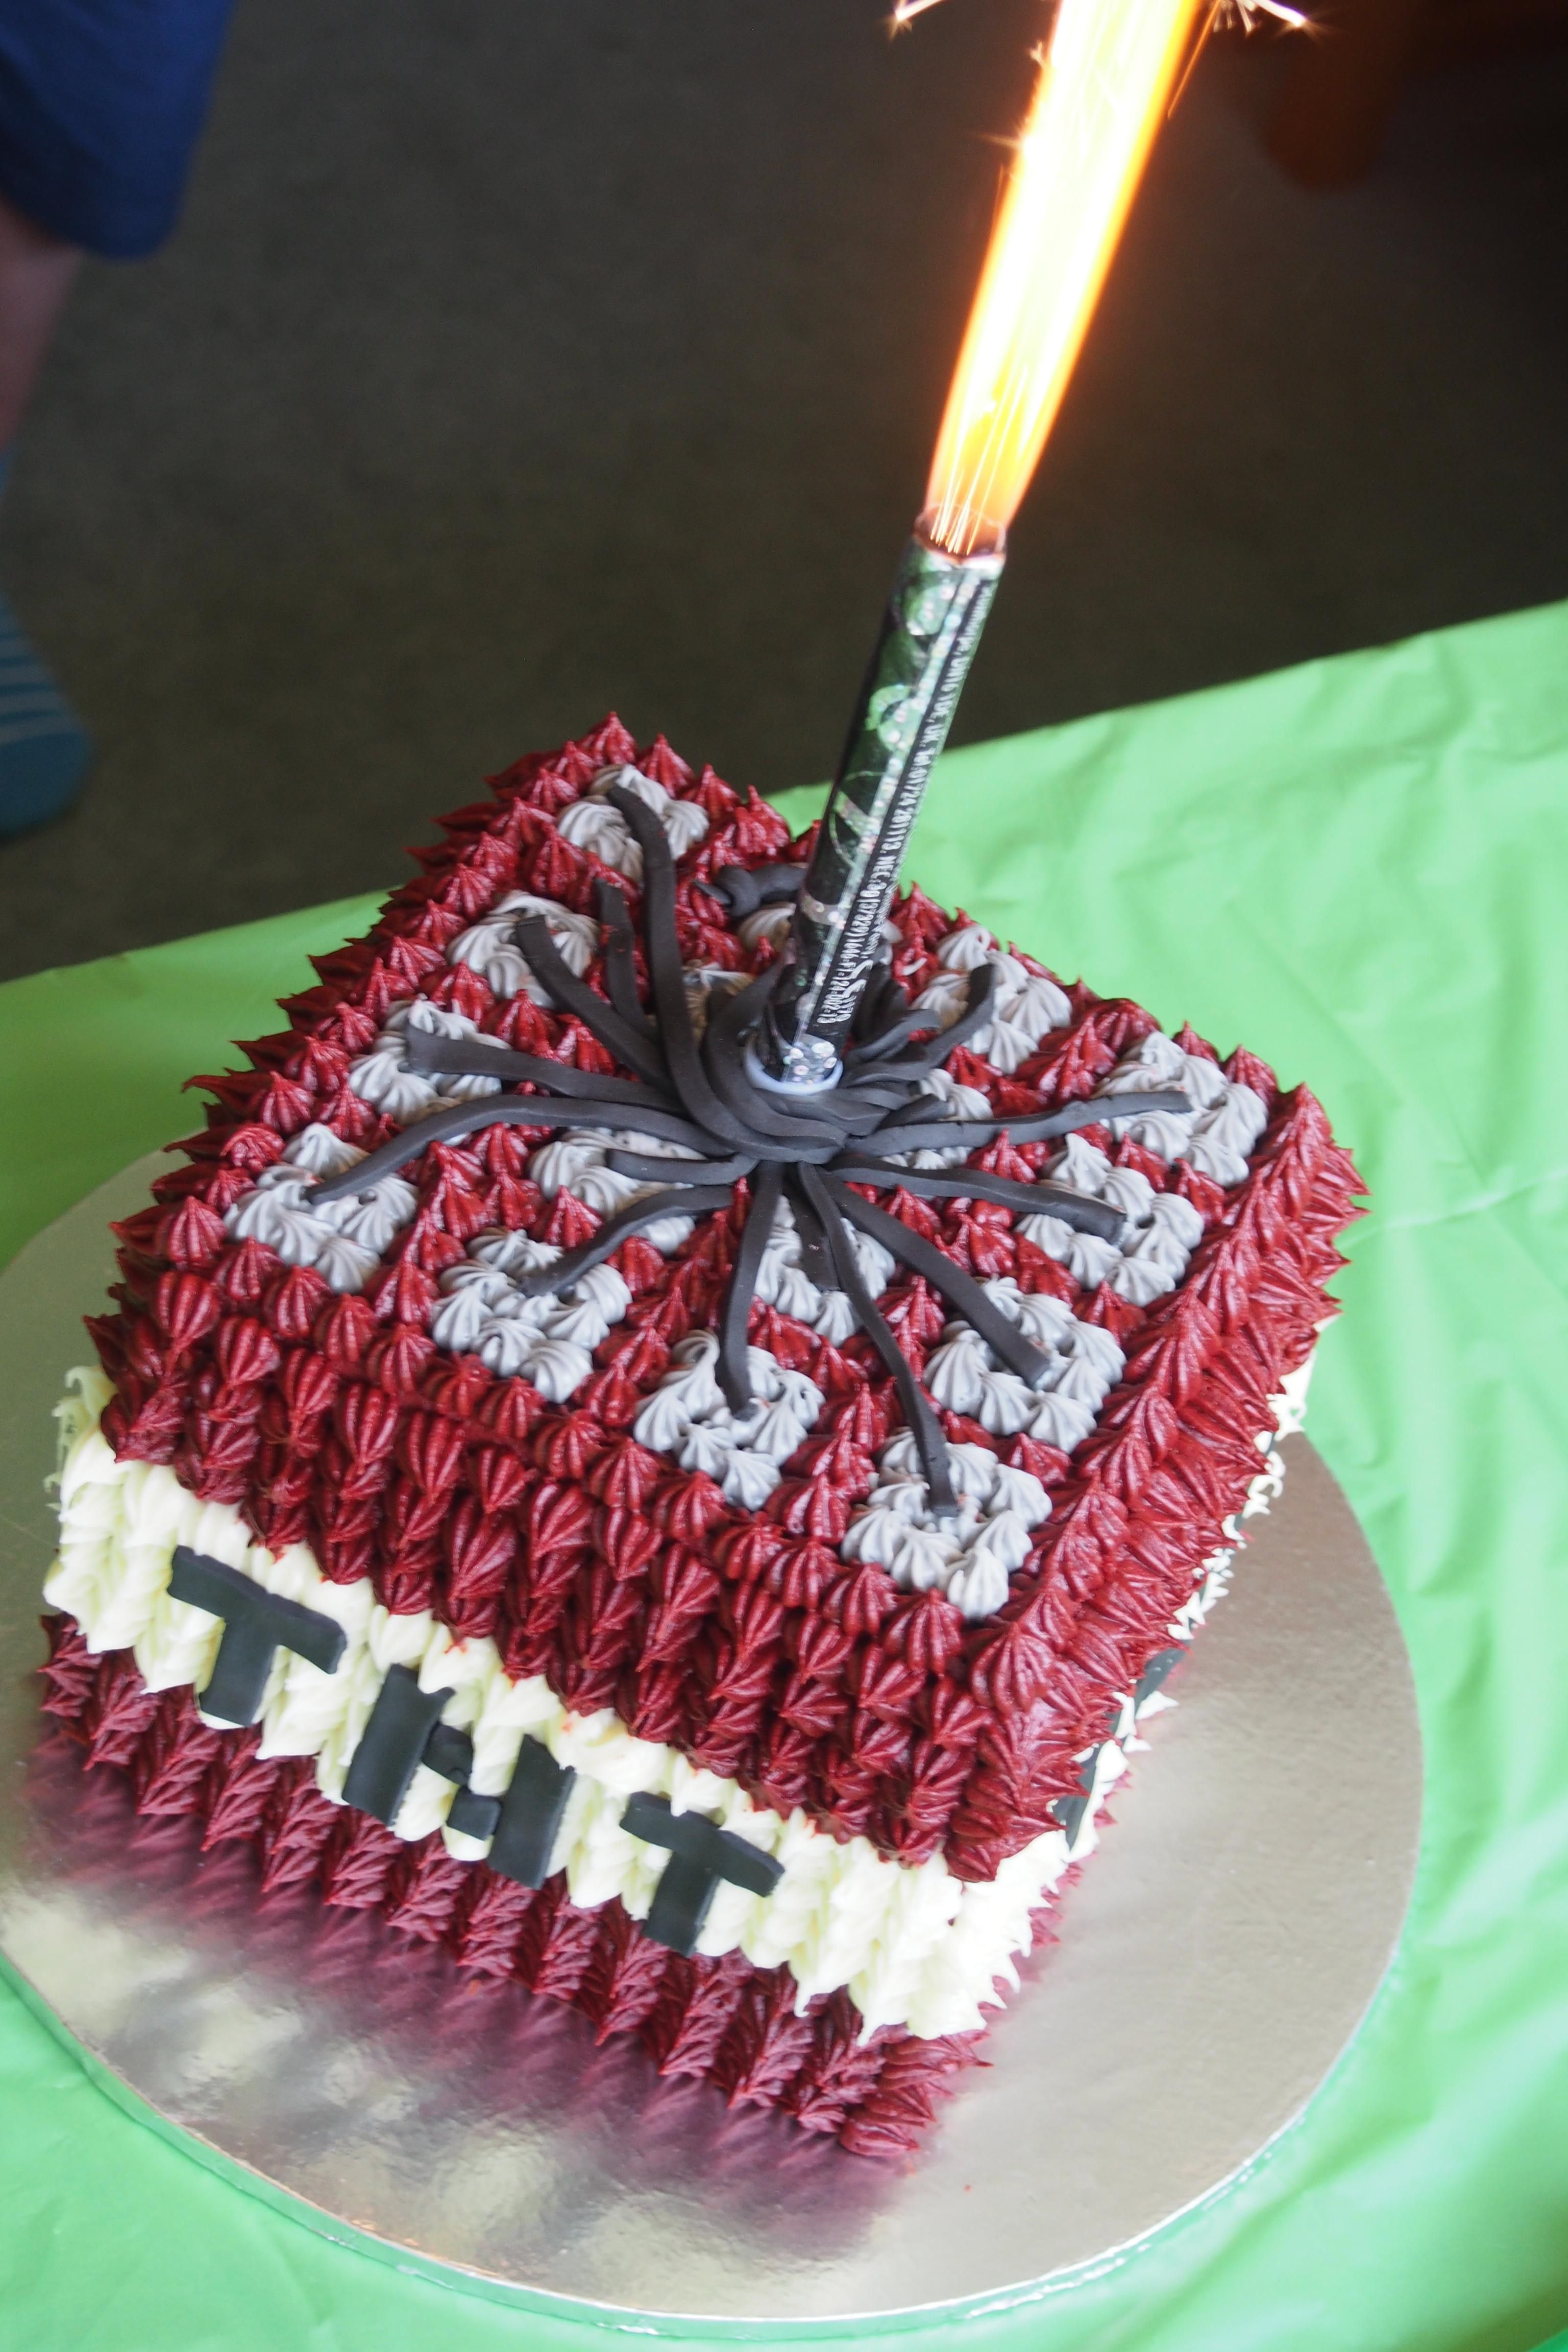 Minecraft Tnt Block Cake Baking Cooking Food Recipes Cake